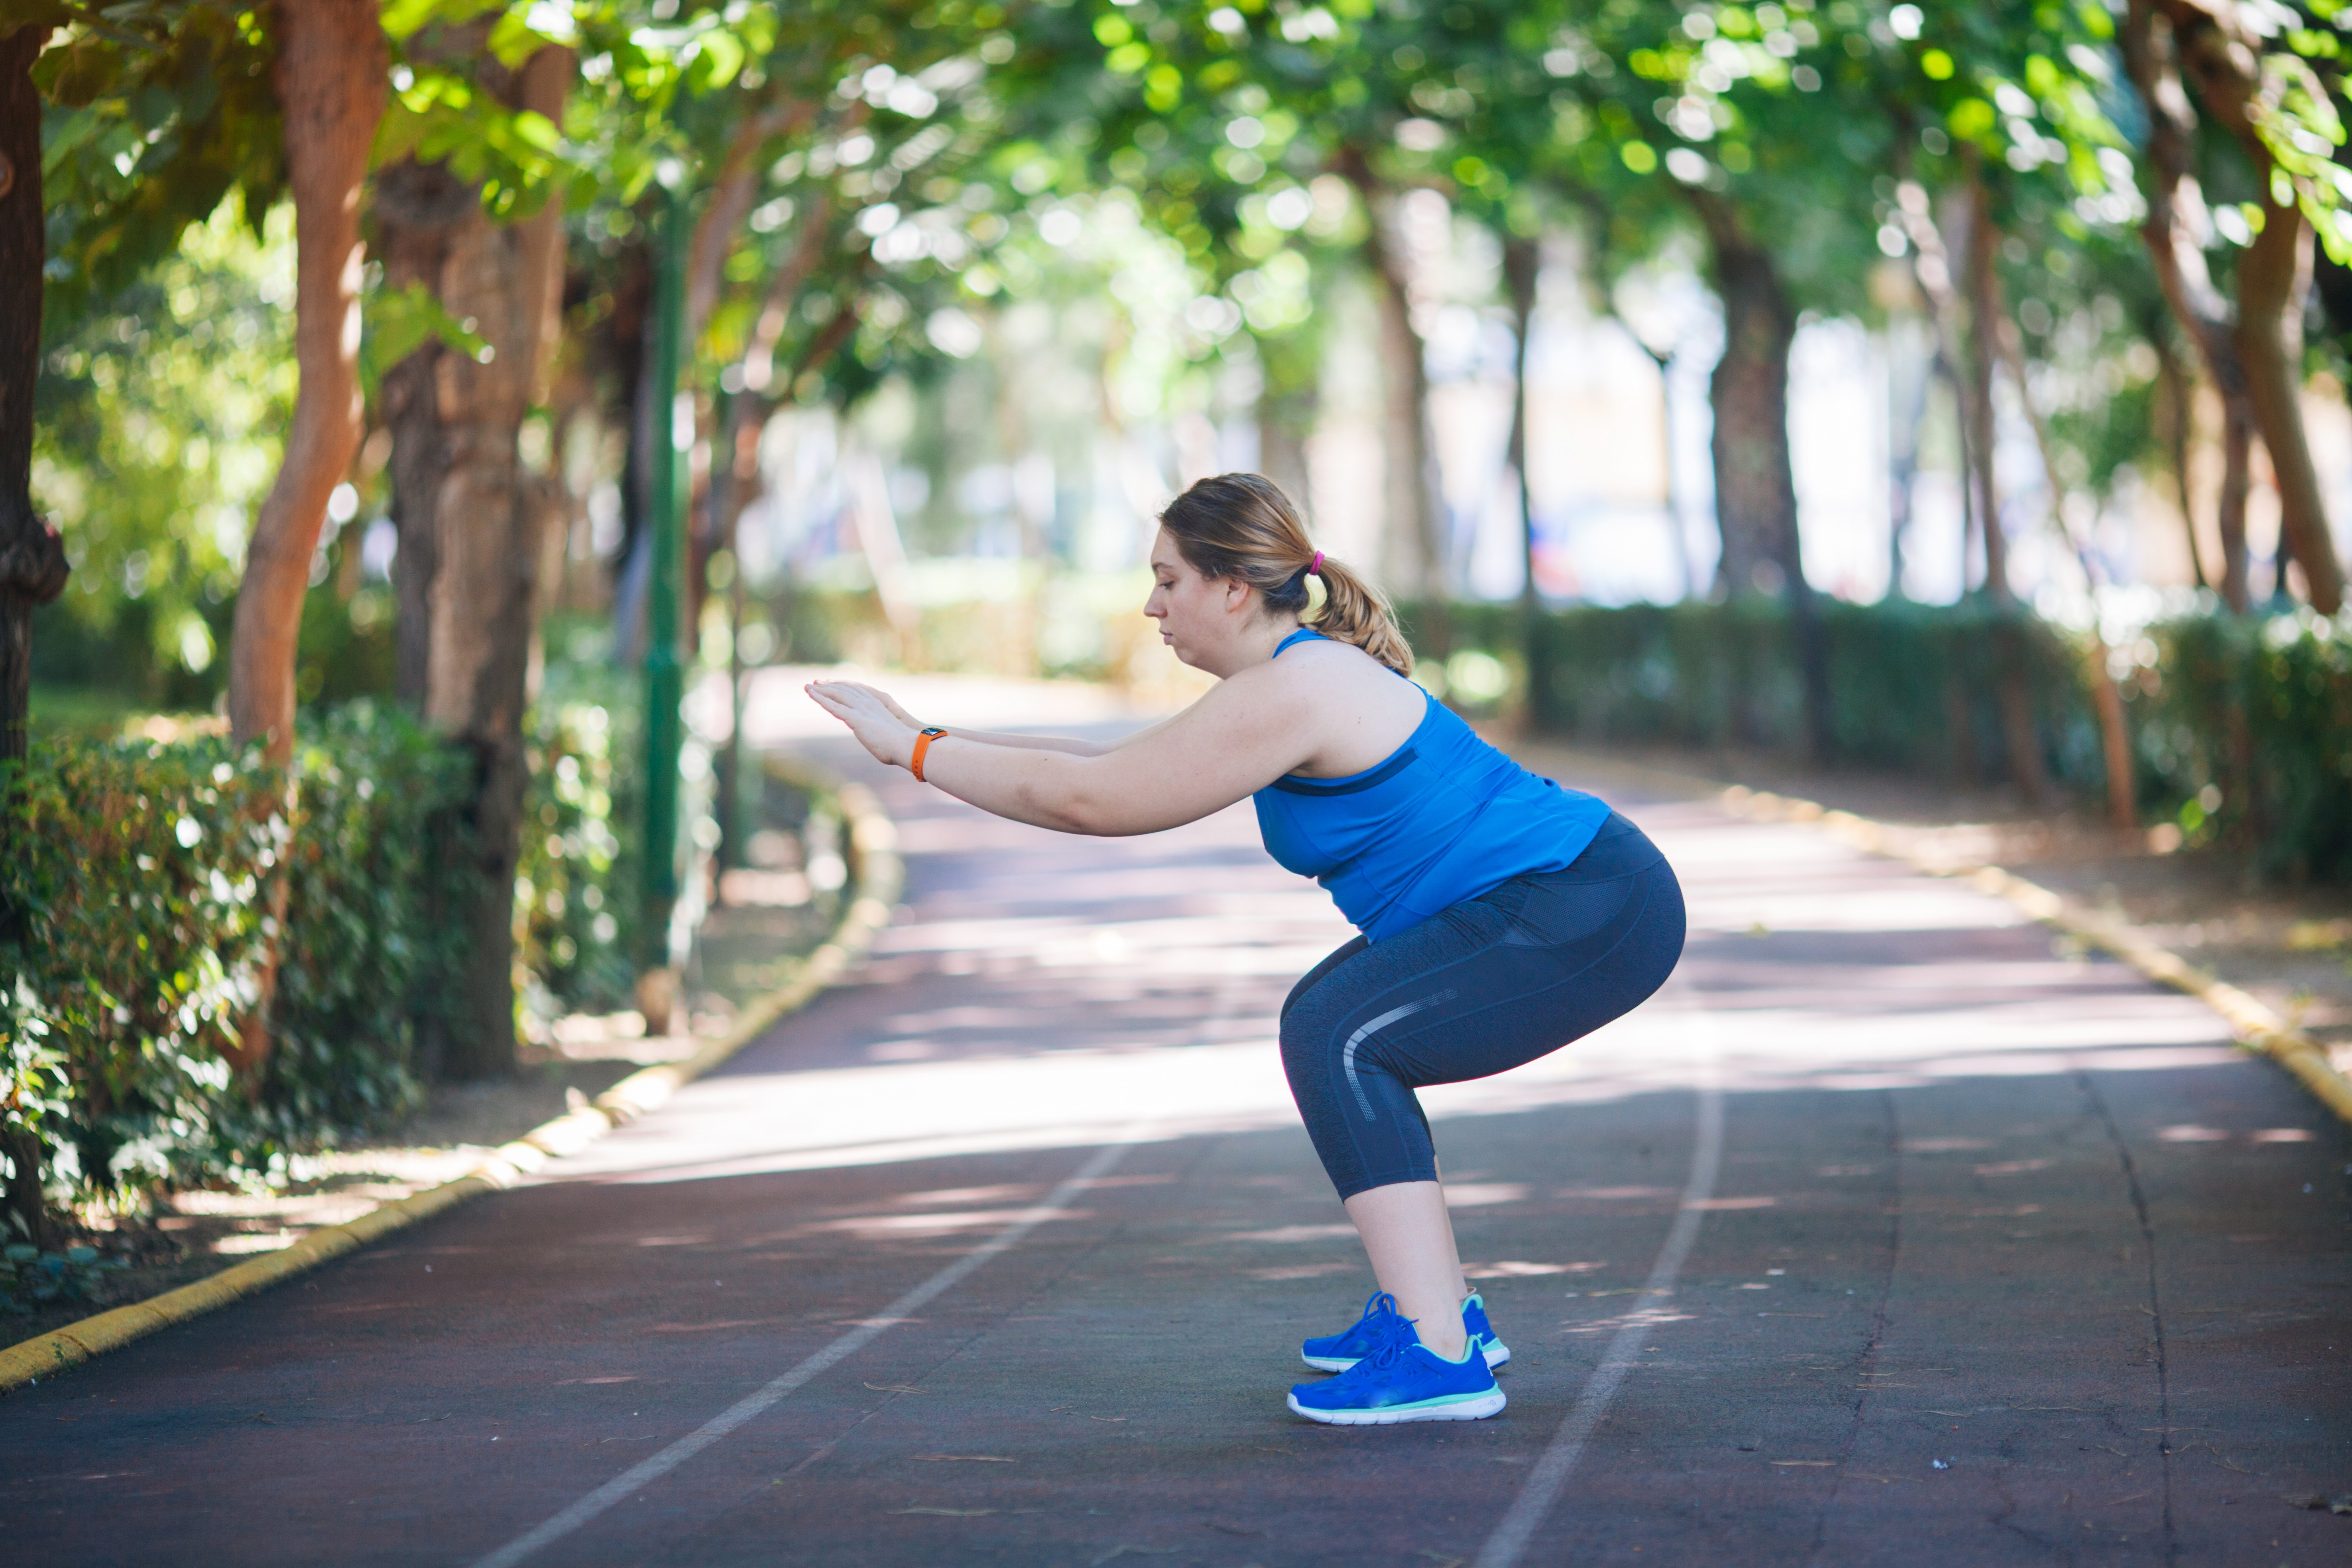 woman doing squat workout outside